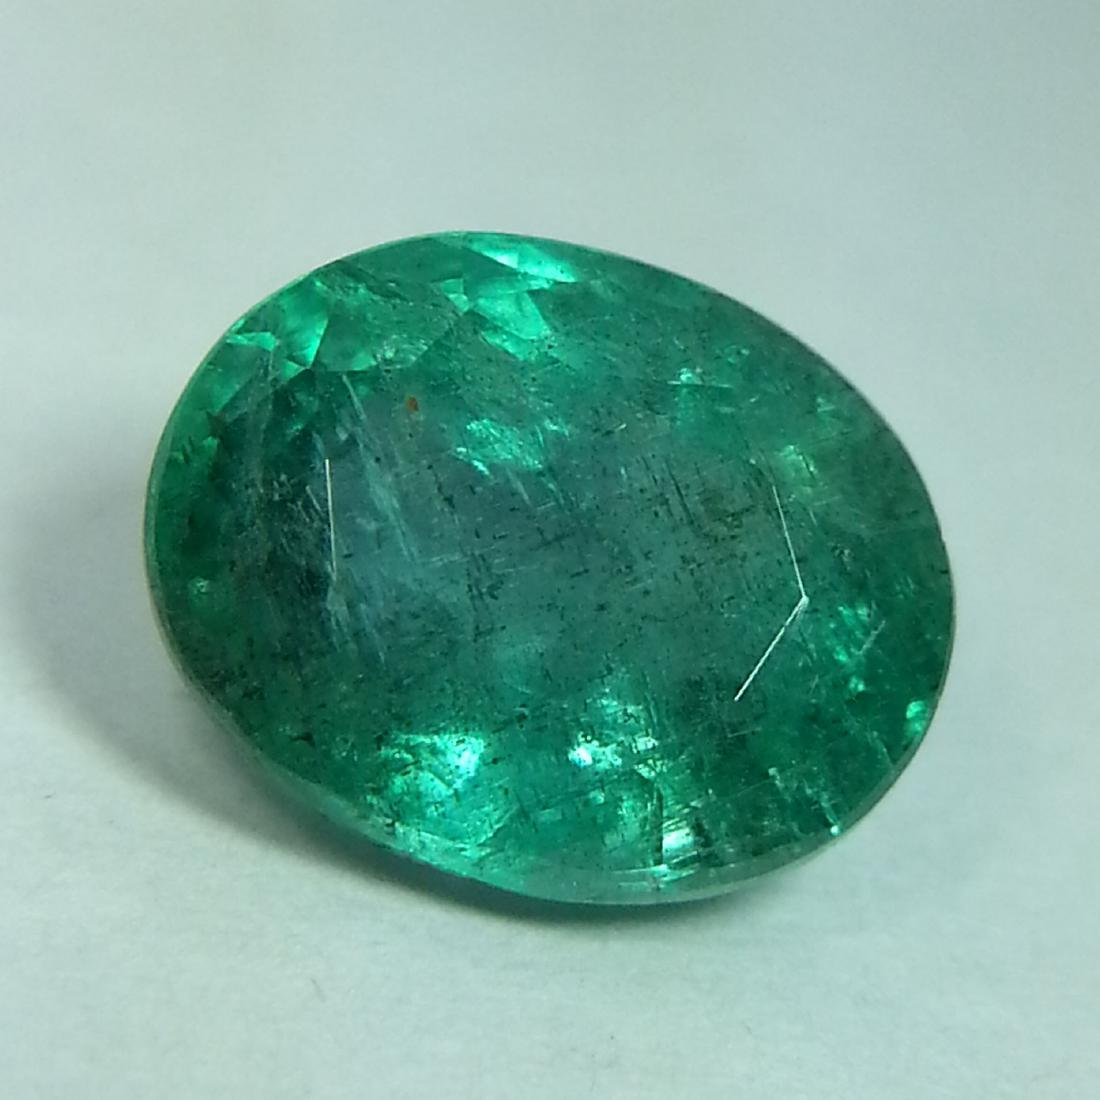 Emerald - 2.62 ct - 2